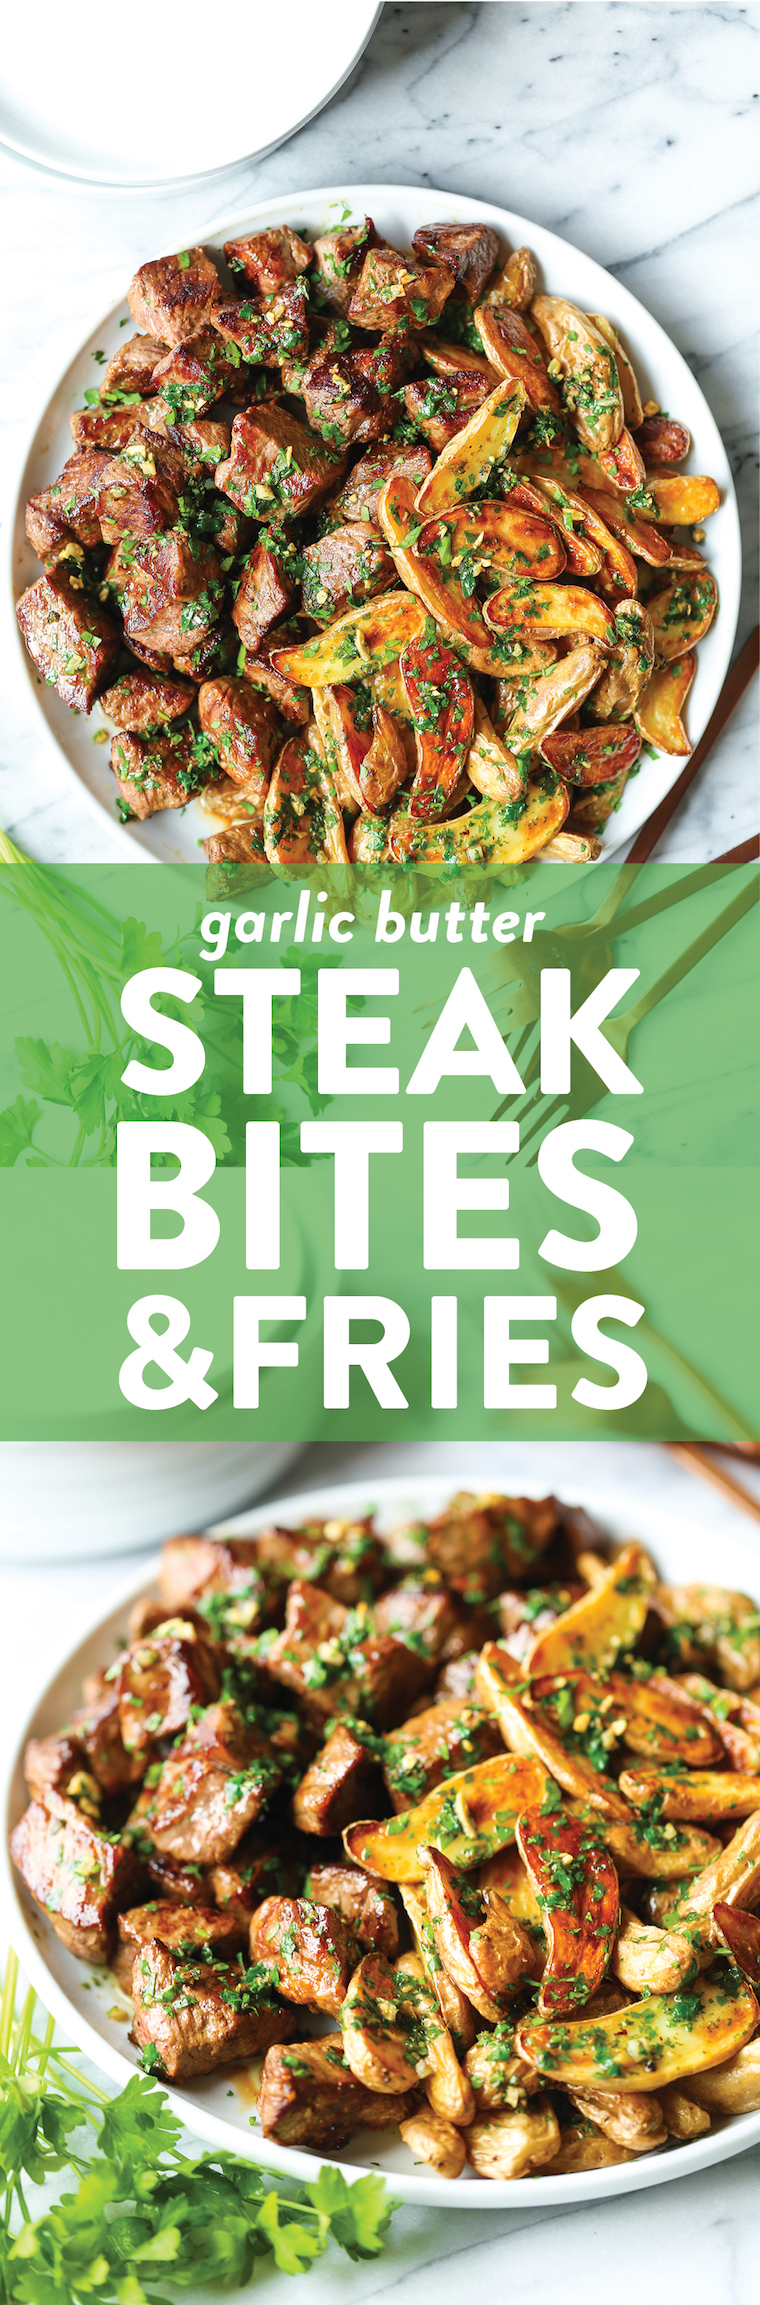 Garlic Butter Steak Bites and Fries